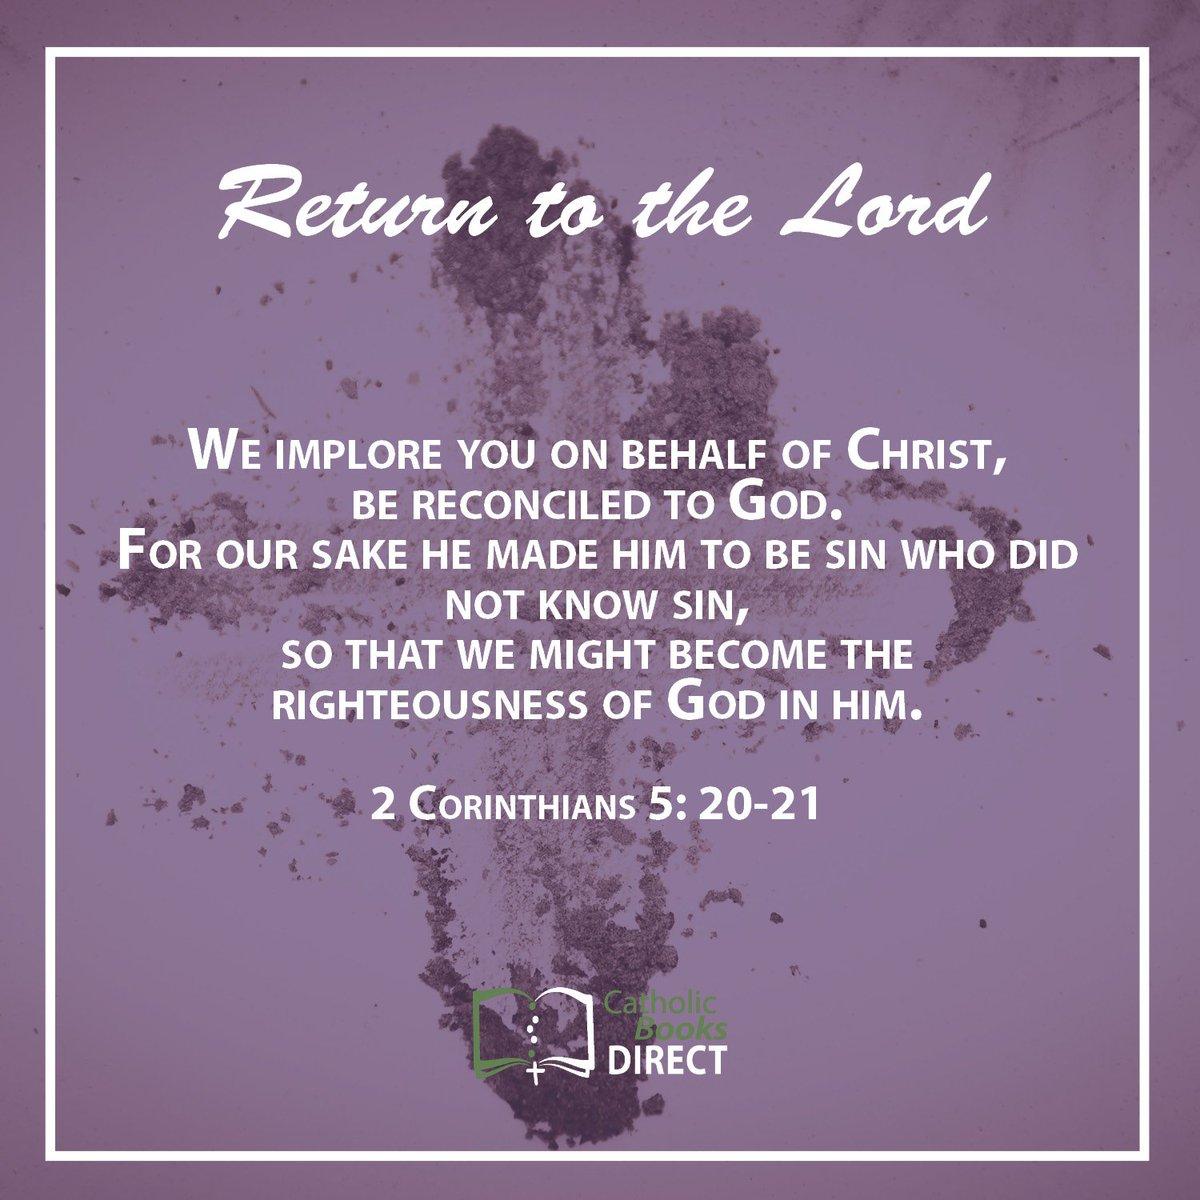 Return to the Lord this Lent! #AshWednesday #Lent #Catholic